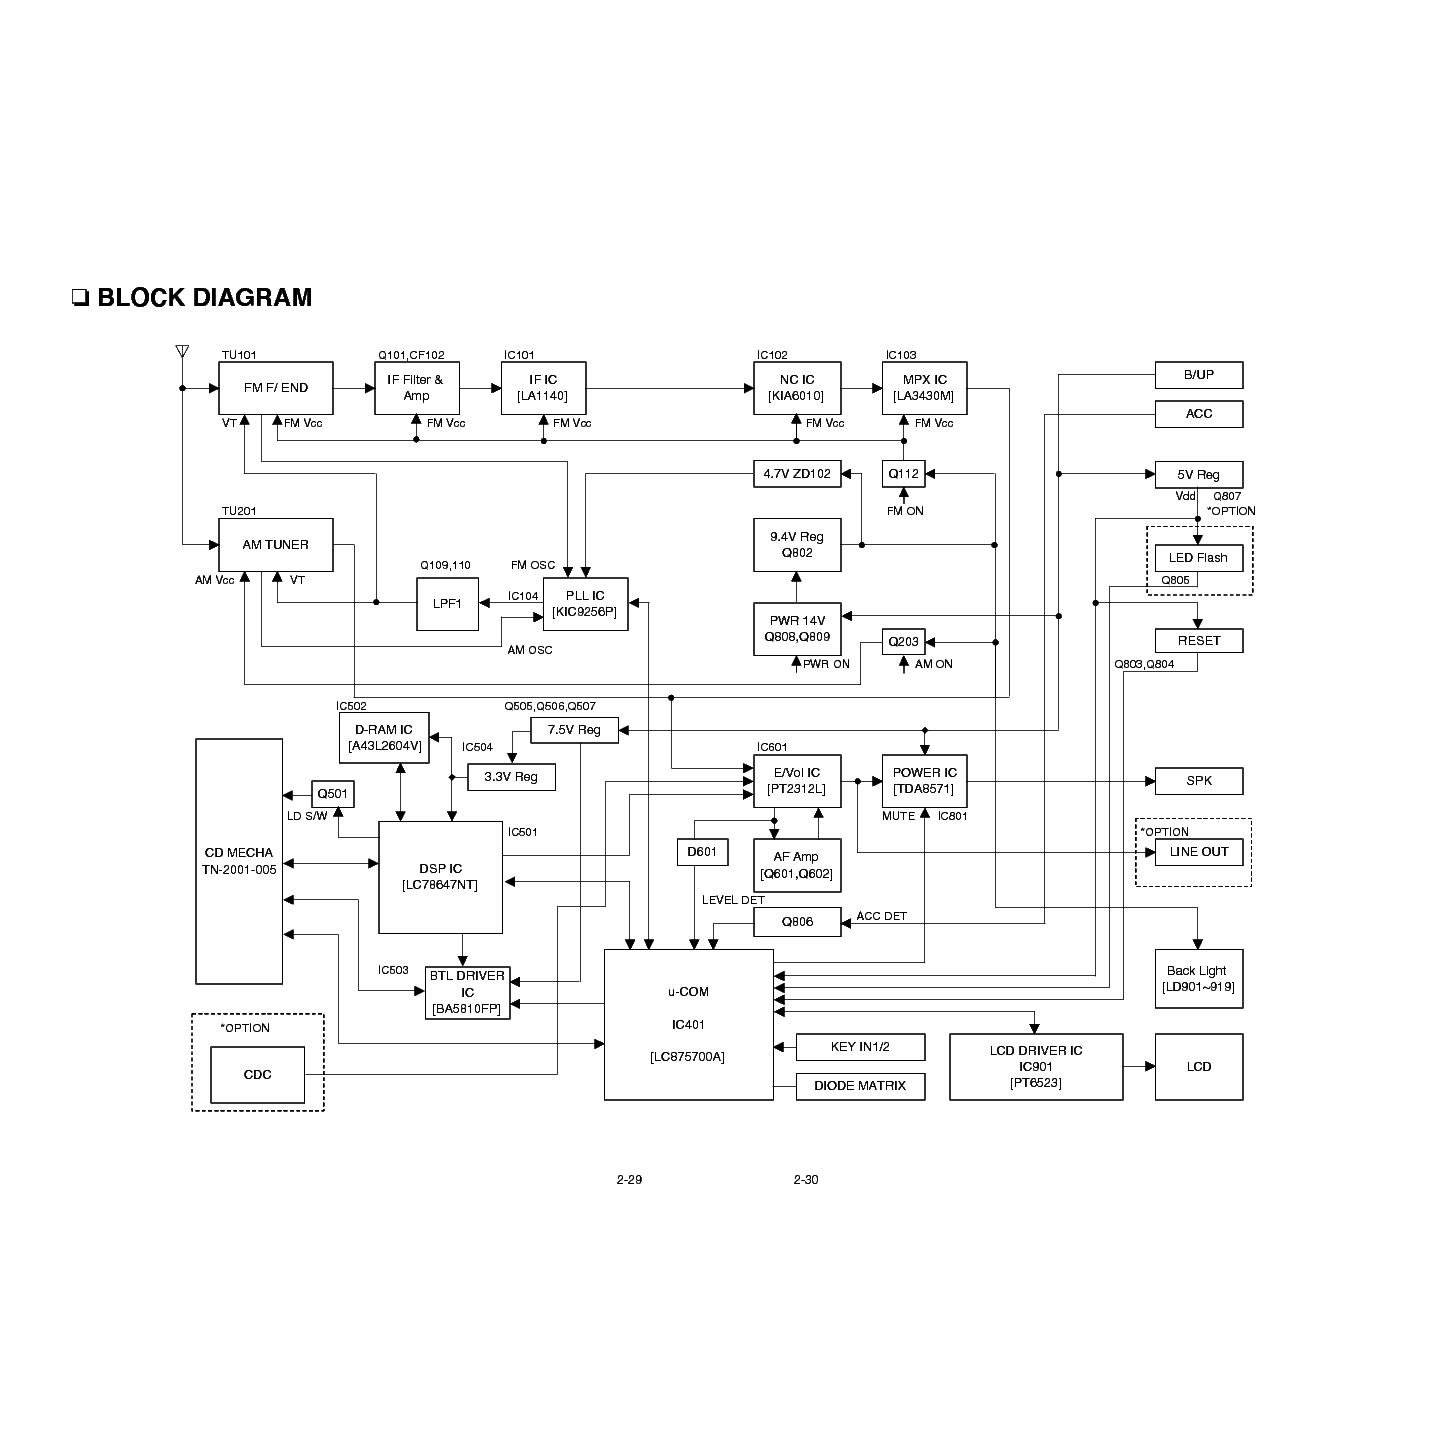 LG TCH-700,TCH-710 service manual (1st page)